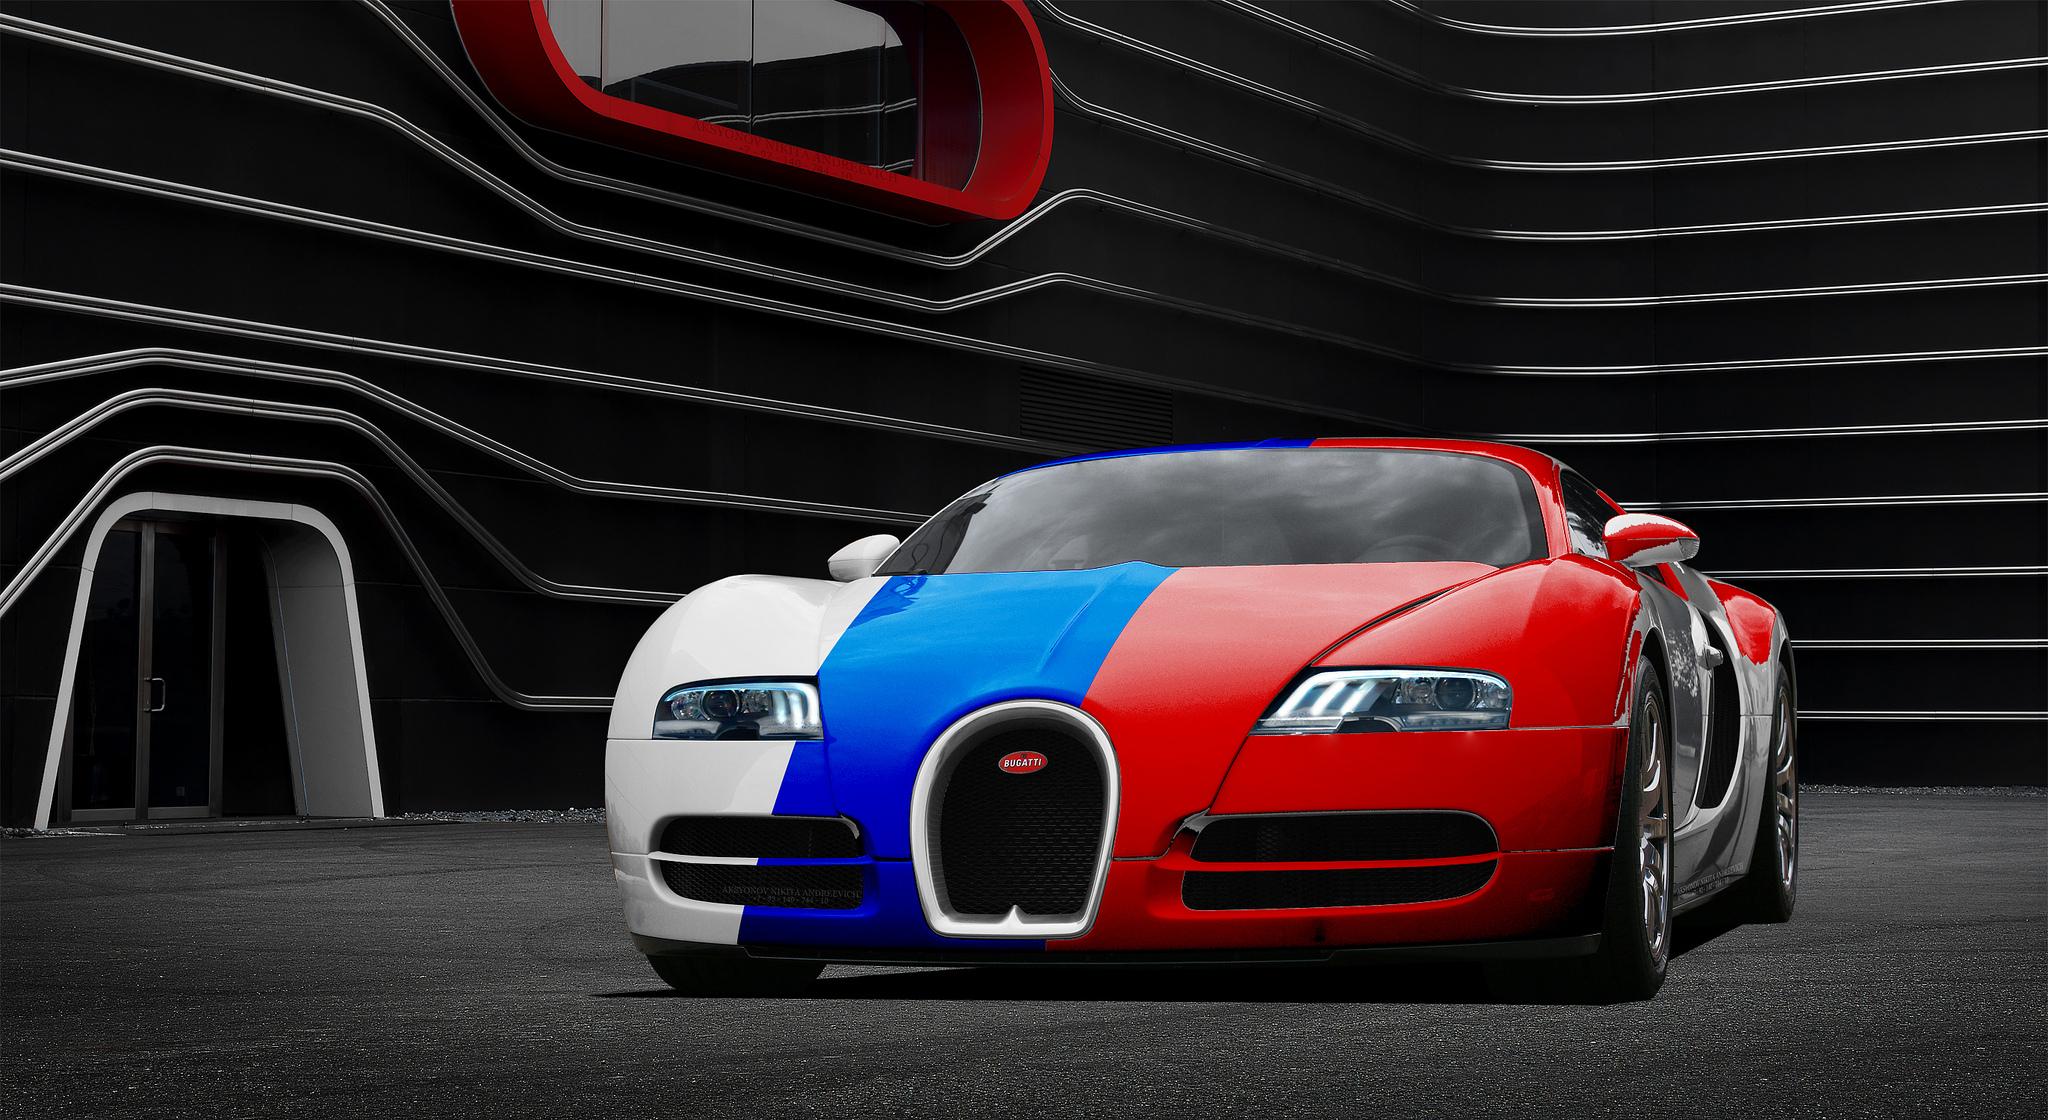 bugatti veyron full hd duvarka d and arka plan 2048x1120 id 397629. Black Bedroom Furniture Sets. Home Design Ideas